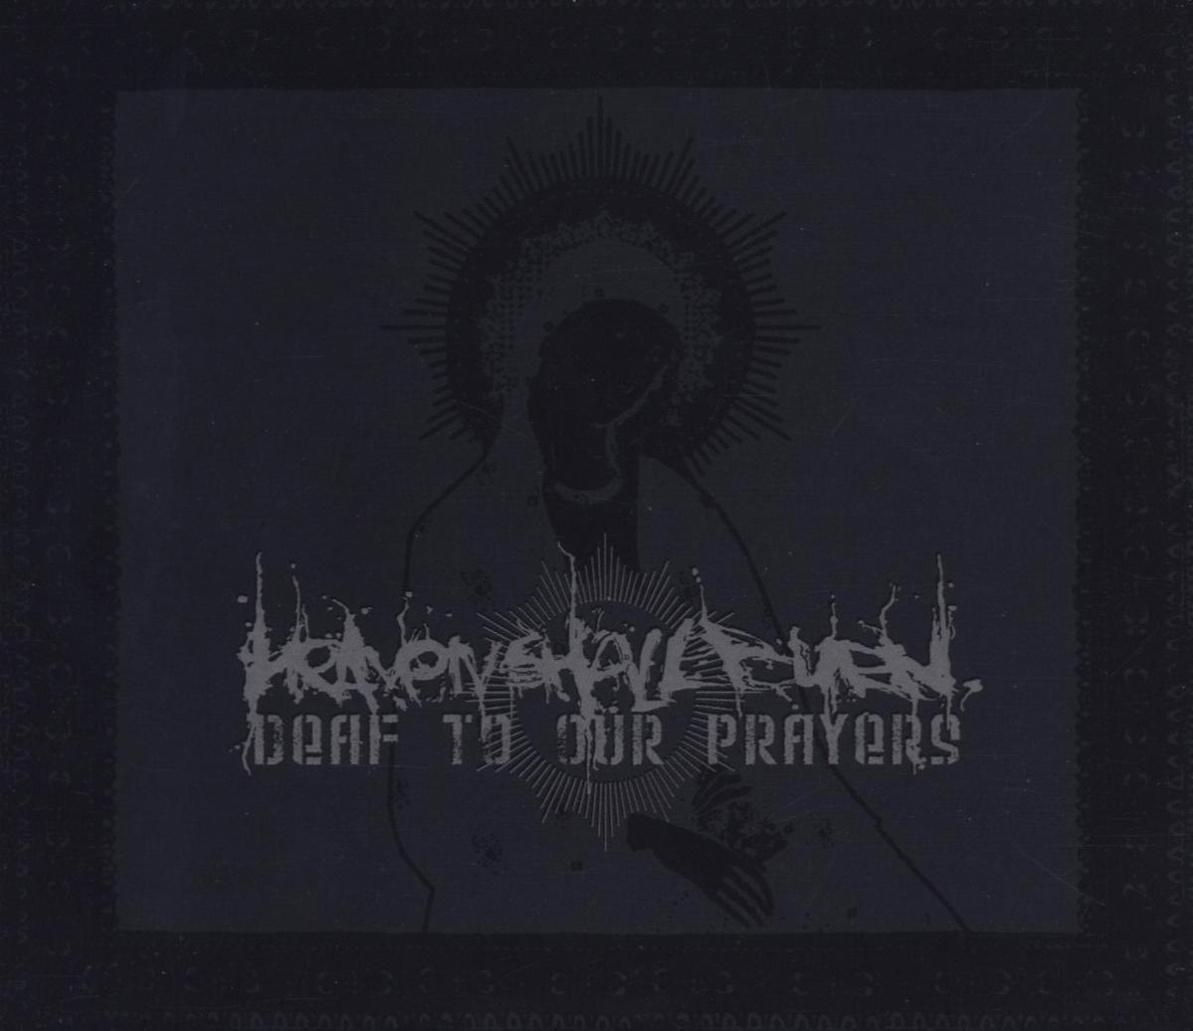 Heaven Shall Burn - Deaf to Our Prayers-Ltd.